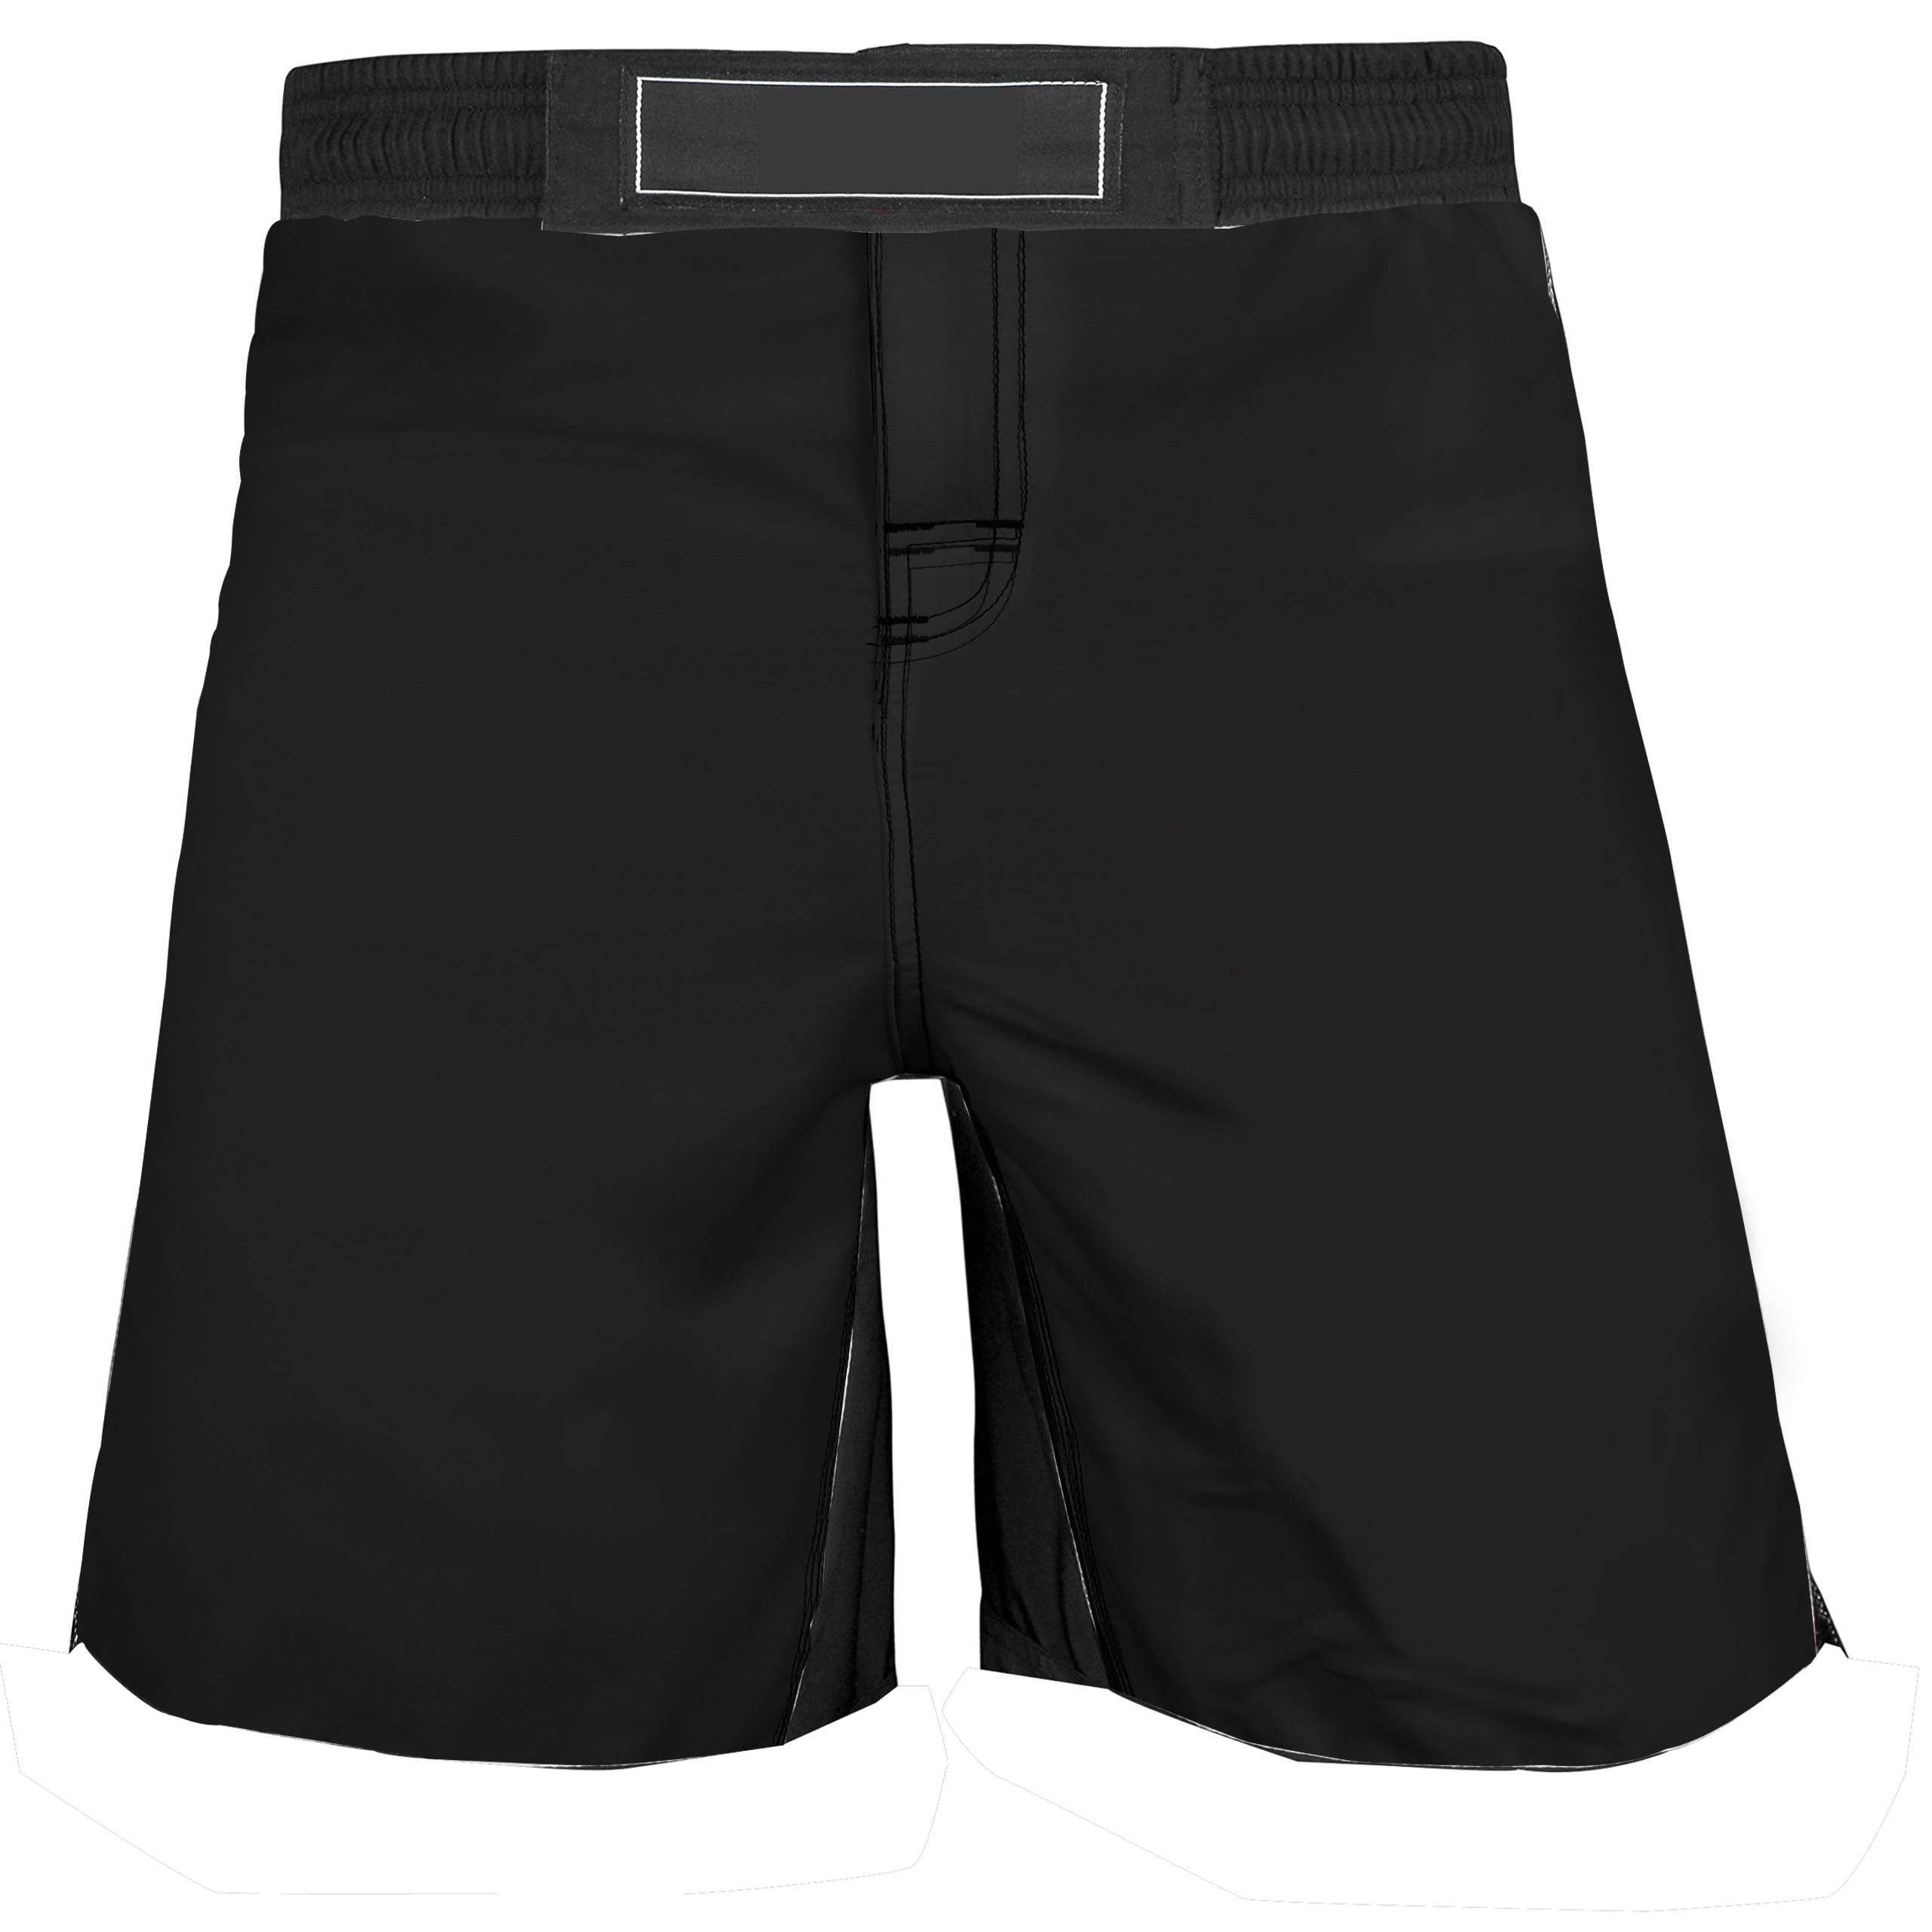 MMA Shorts With Custom Design